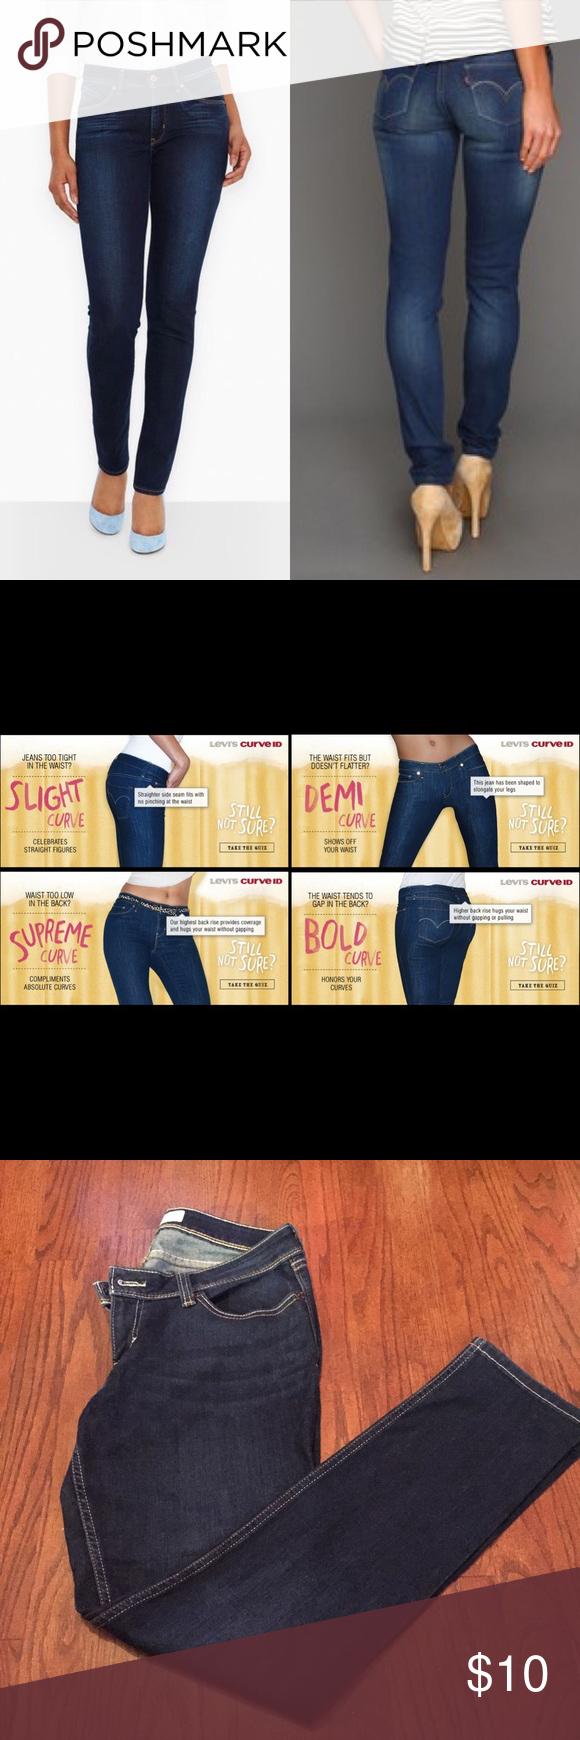 Levi curve ID Demi curve Dark wash denim, EUC, size 13, 58% cotton,24% polyester, 7%viscose,1% spandex. Levi's Jeans Skinny